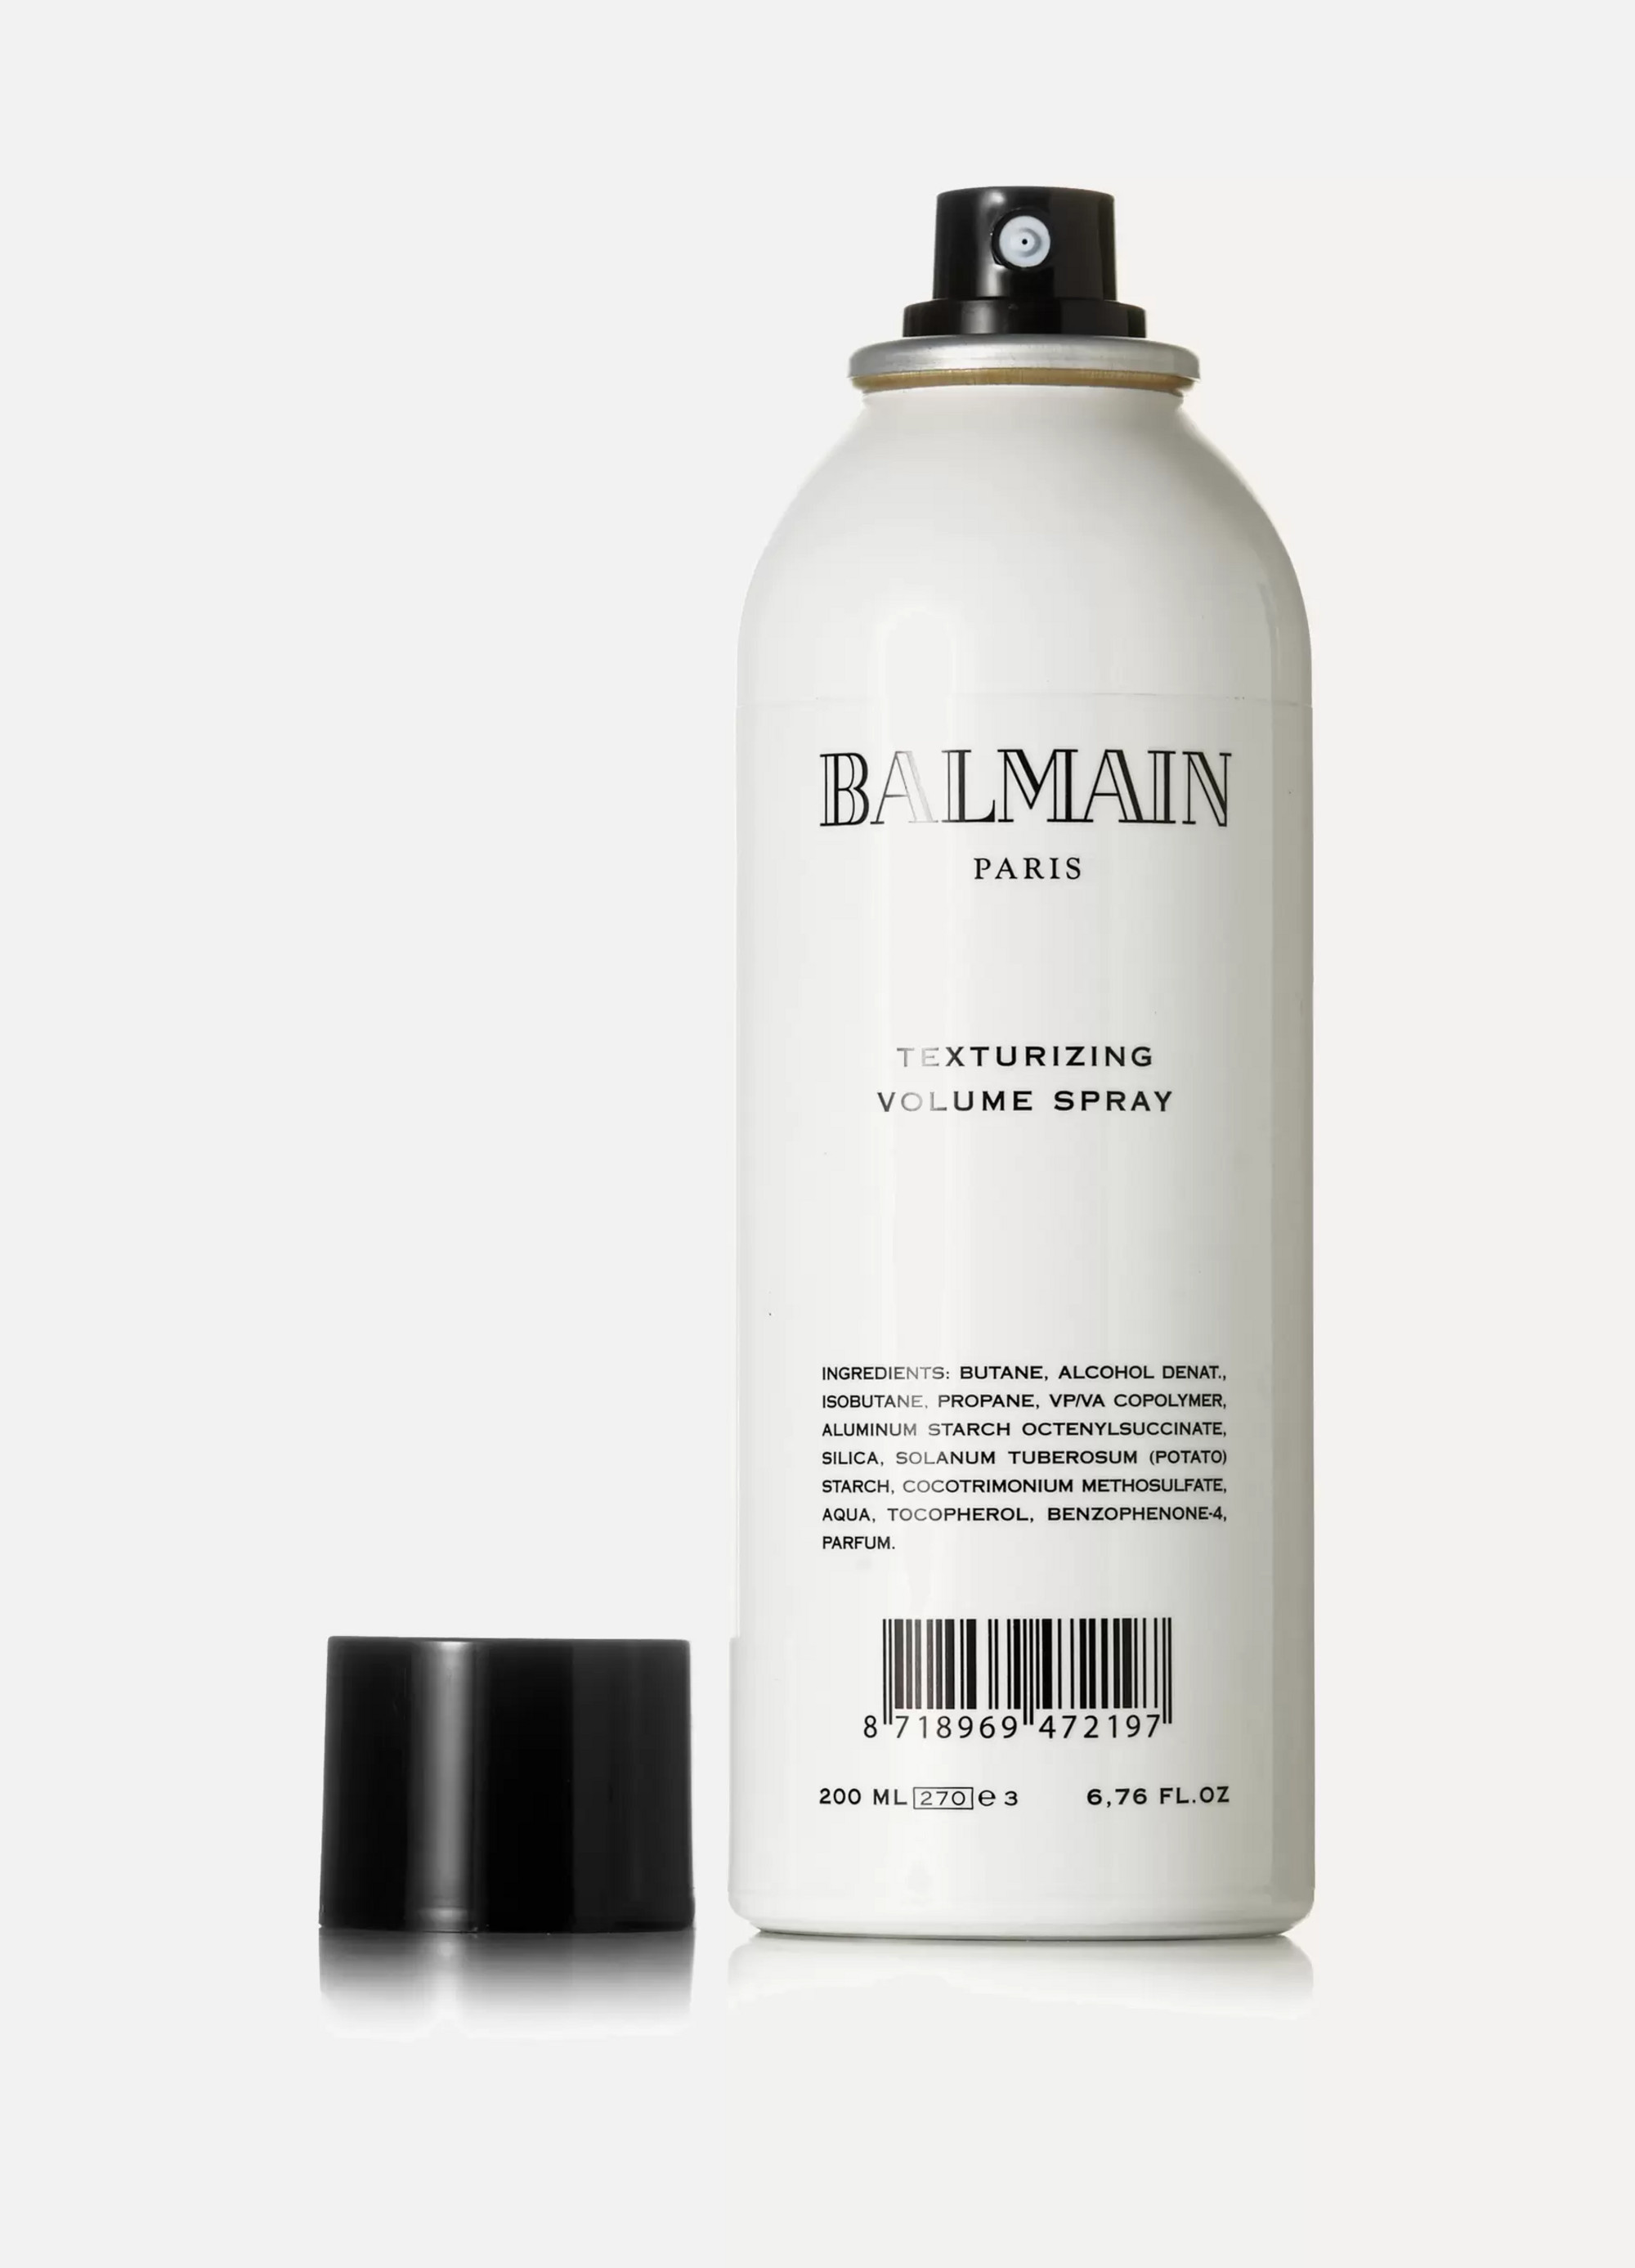 Balmain Paris Hair Couture Texturizing Volume Spray, 200ml